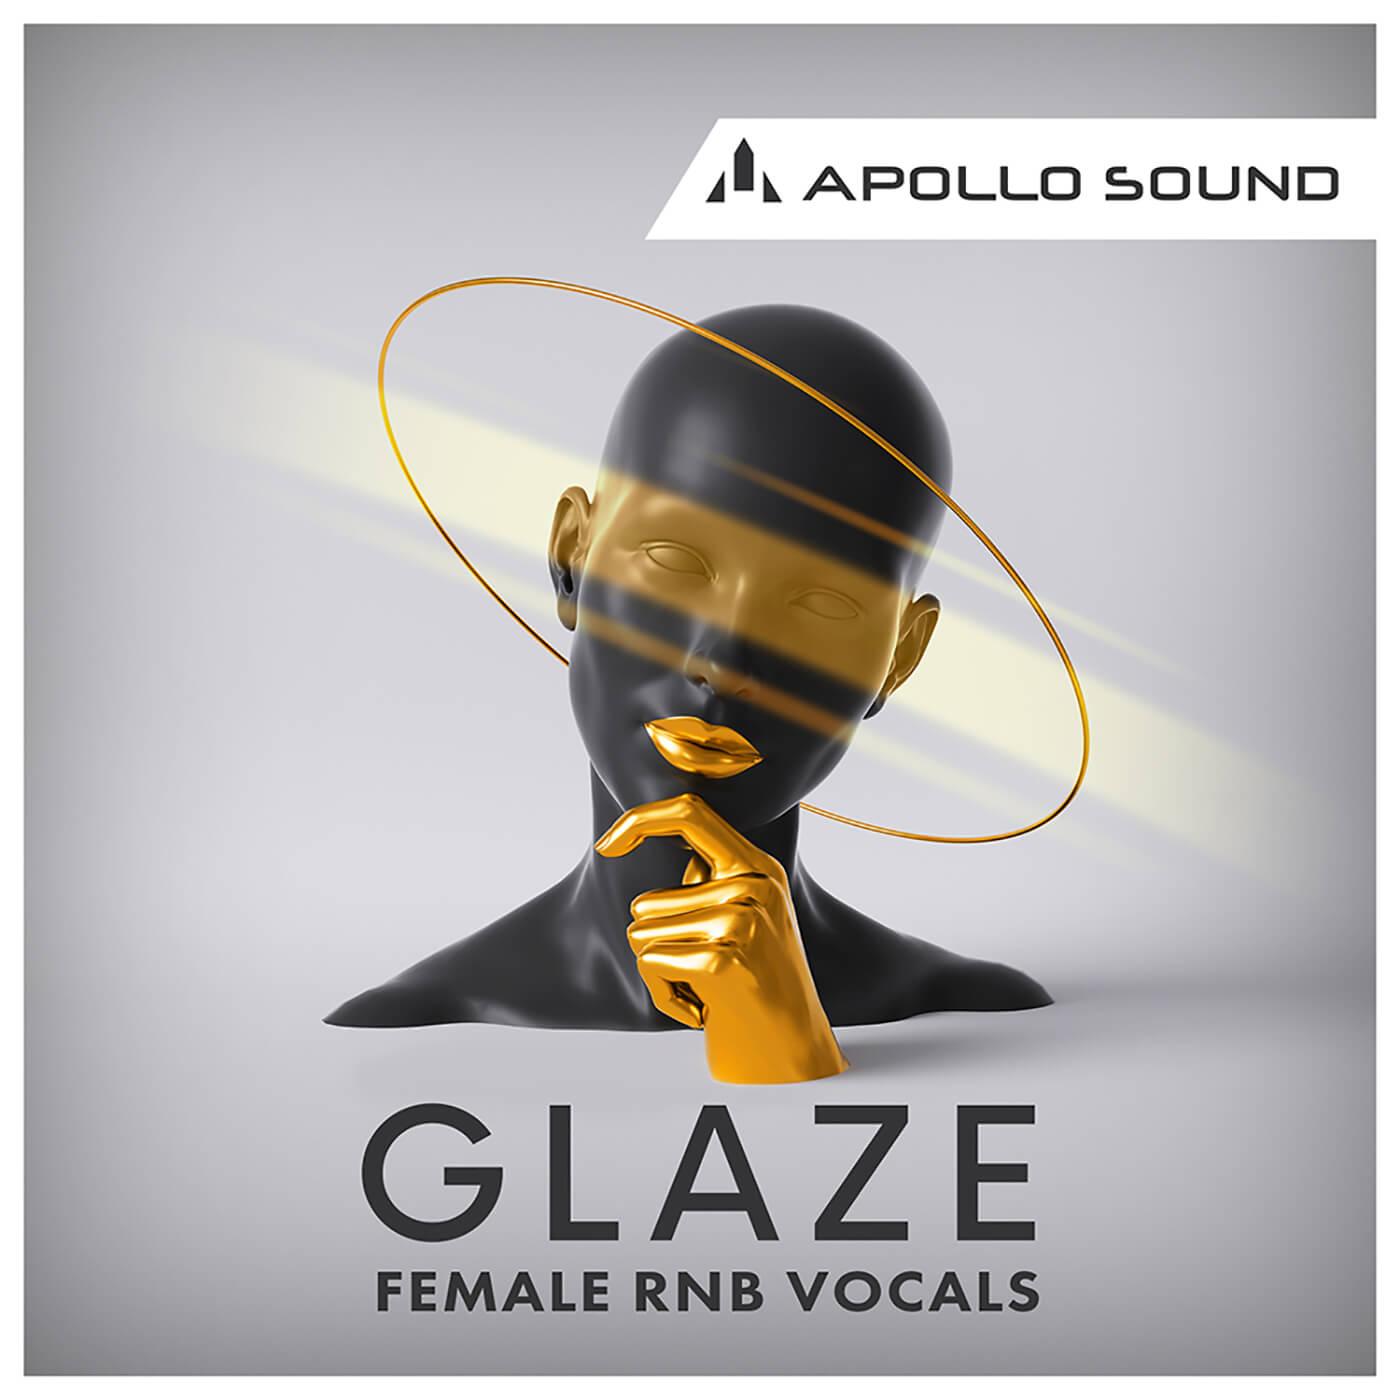 Apollo Sounds - Glaze Female Vocals